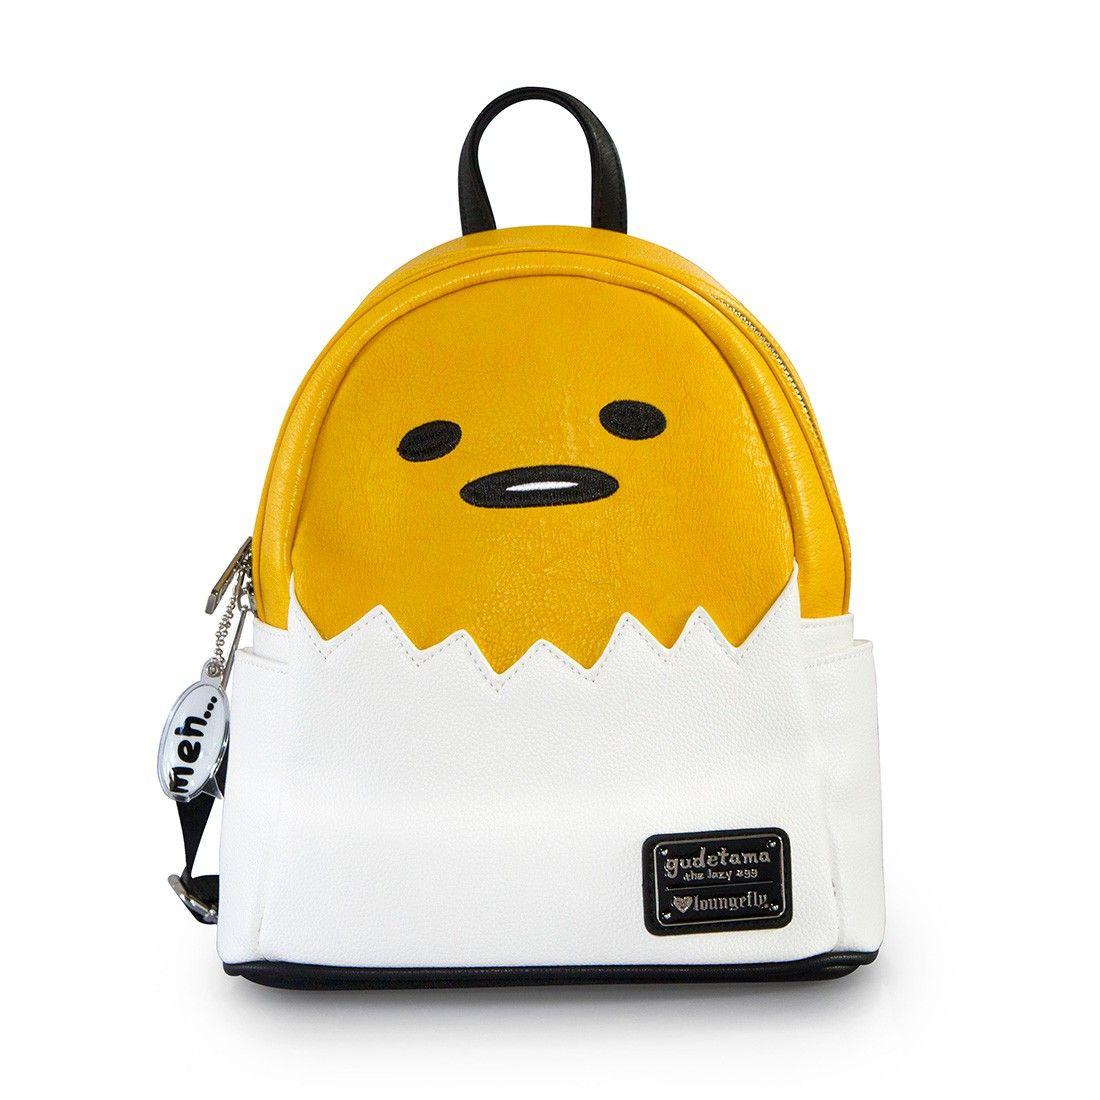 736328912f8 Loungefly x Gudetama Mini Faux Leather Backpack - Backpacks - Hello Sanrio  - Brands